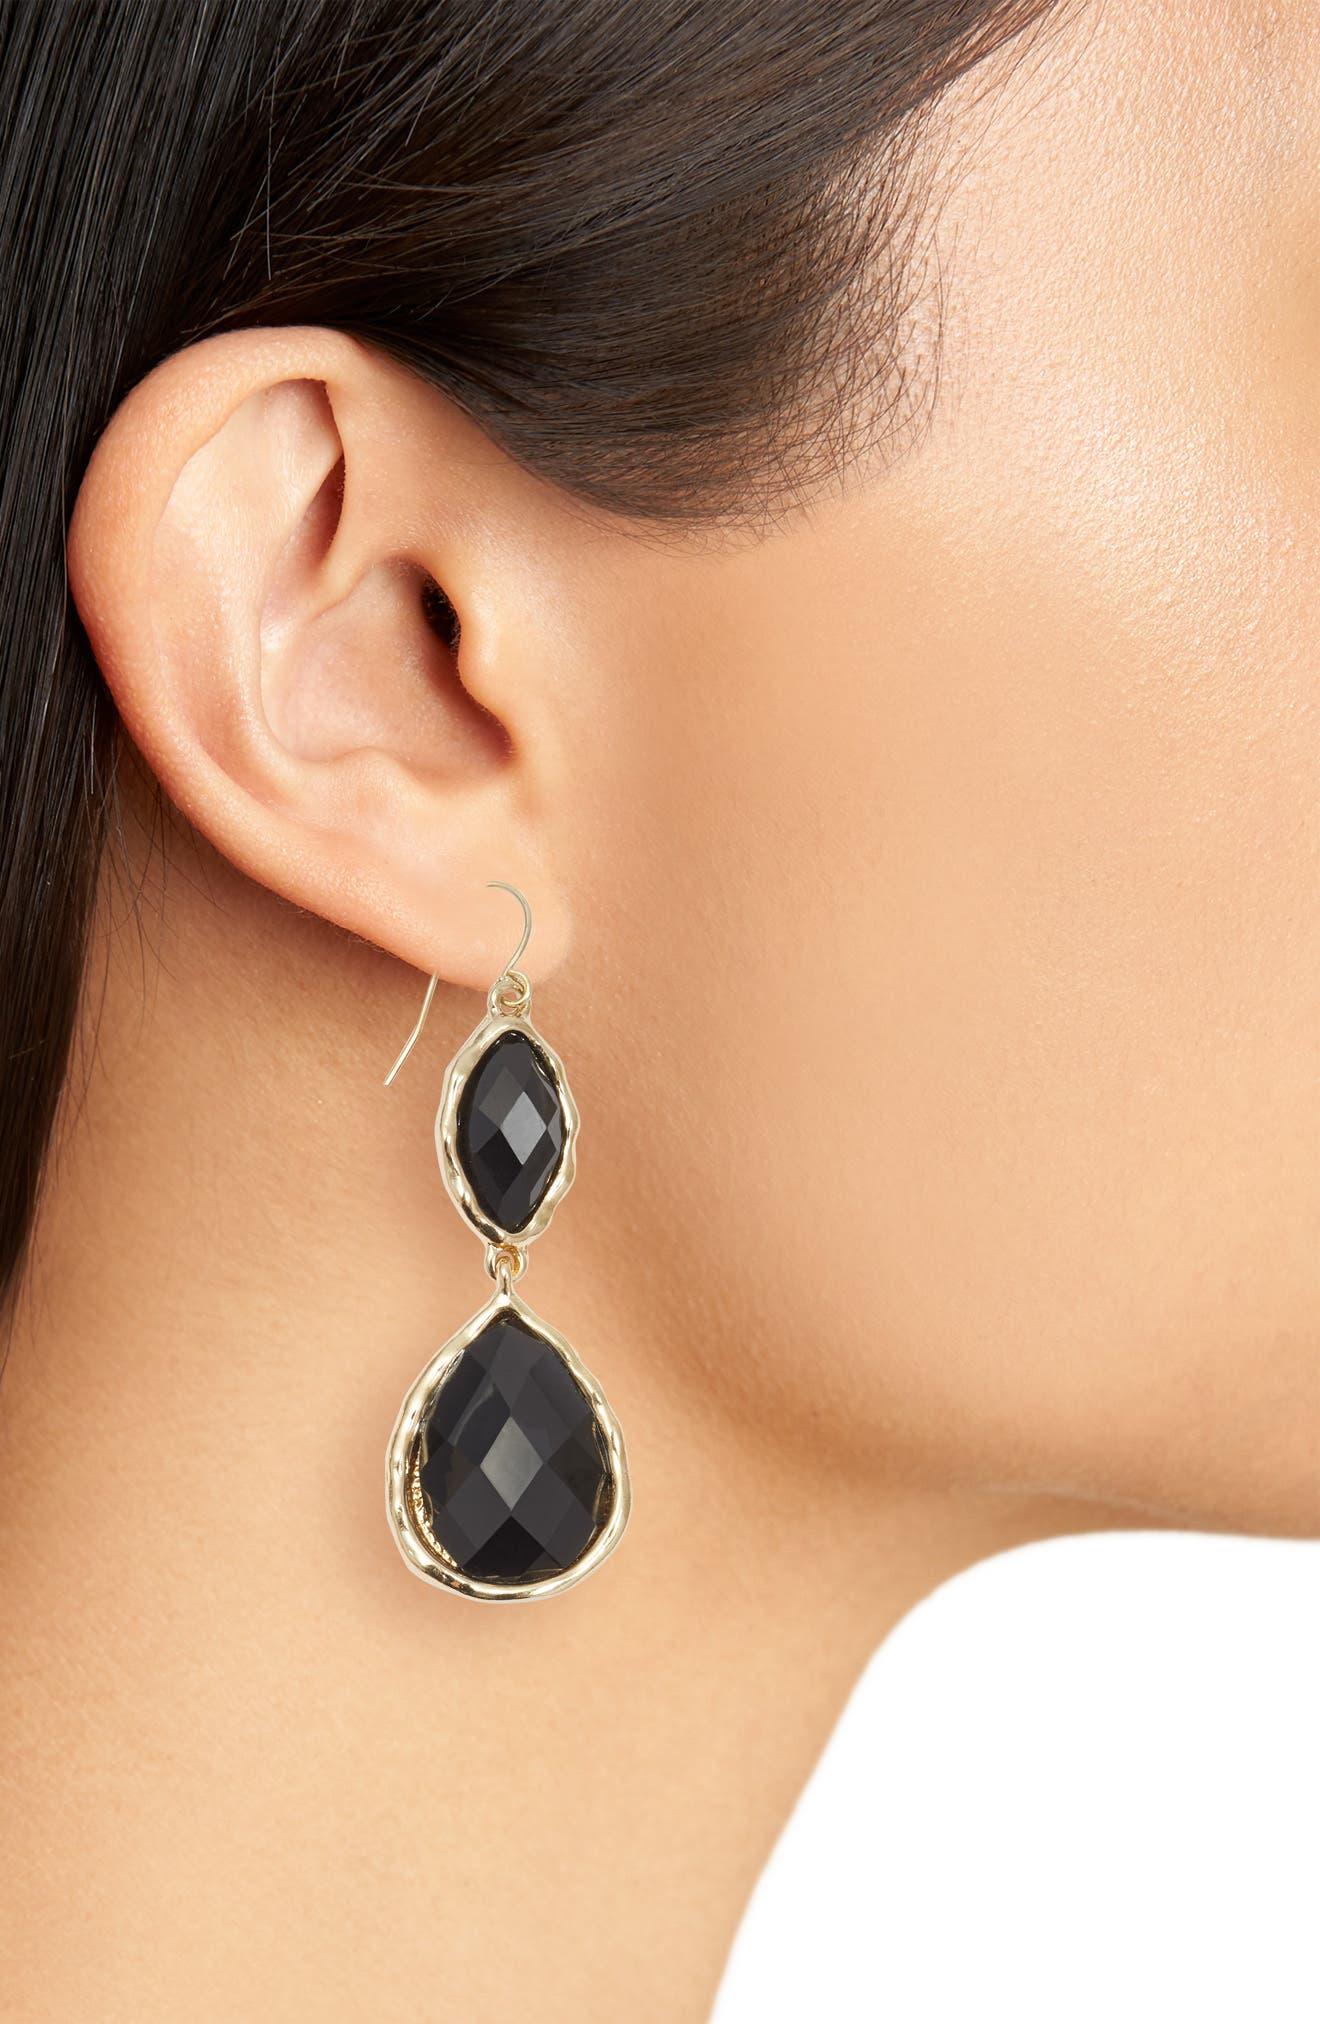 Stone Drop Earrings,                             Alternate thumbnail 2, color,                             001